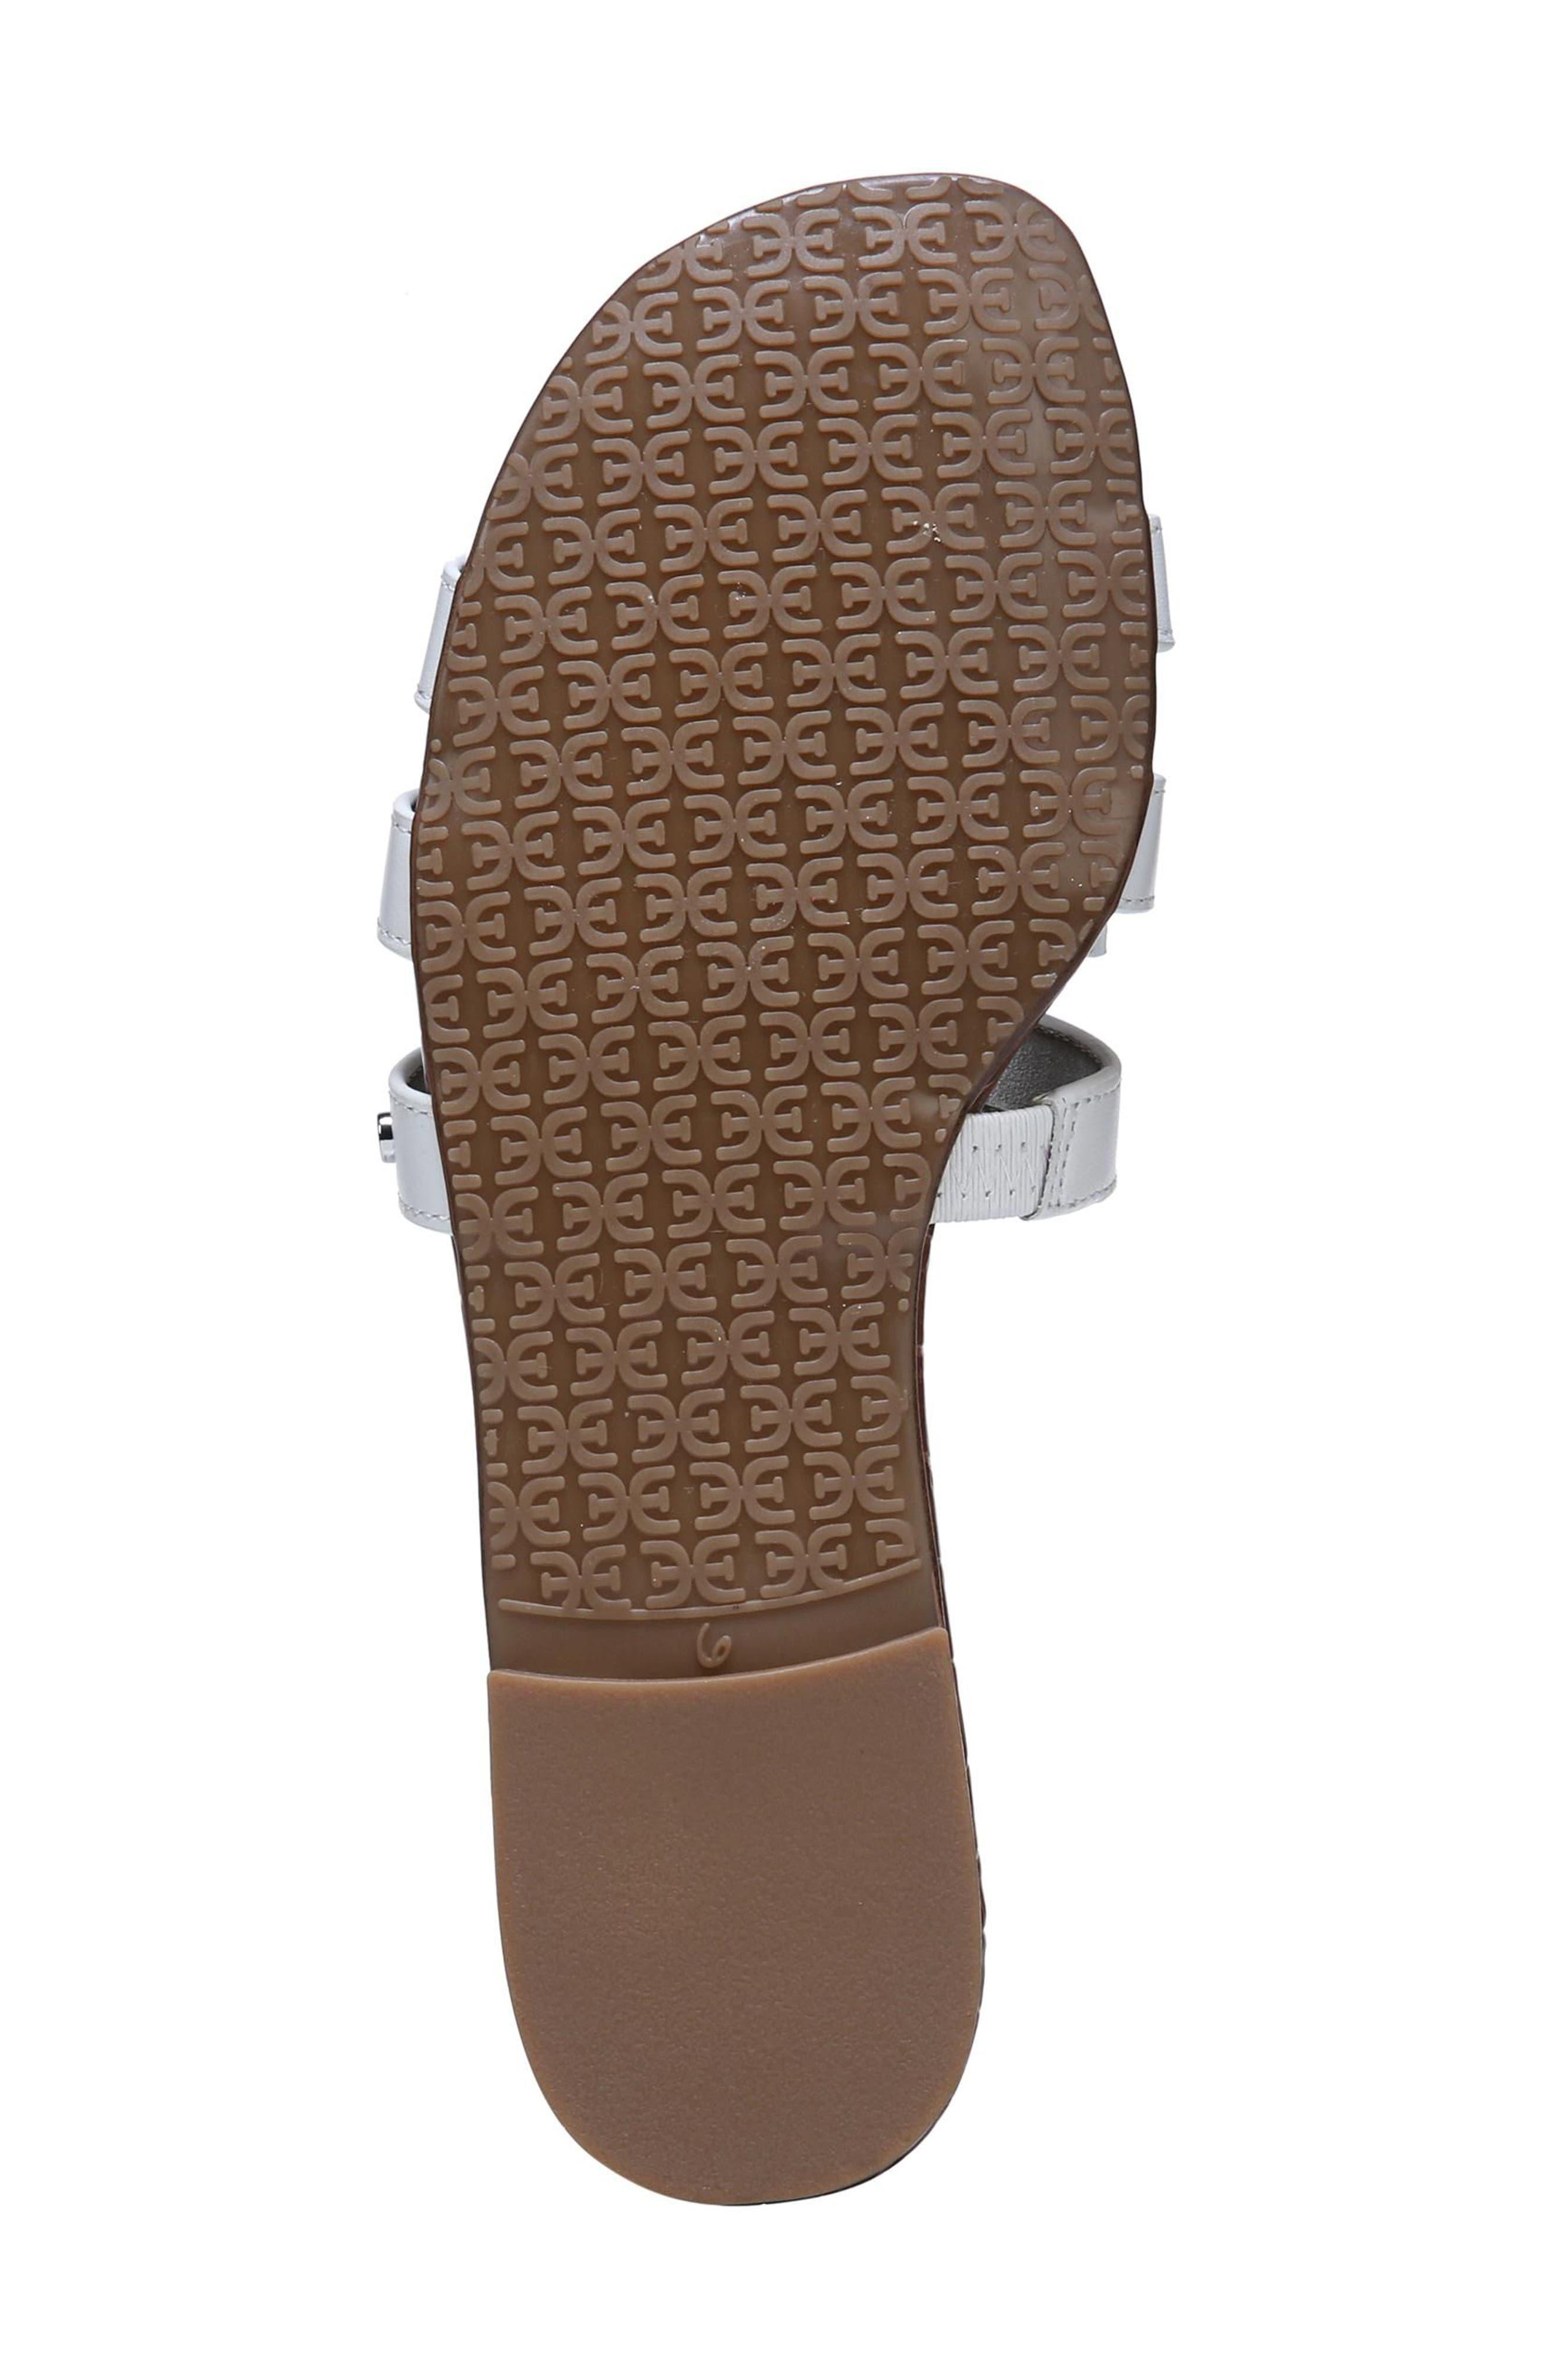 Bay Cutout Slide Sandal,                             Alternate thumbnail 6, color,                             Bright White Leather